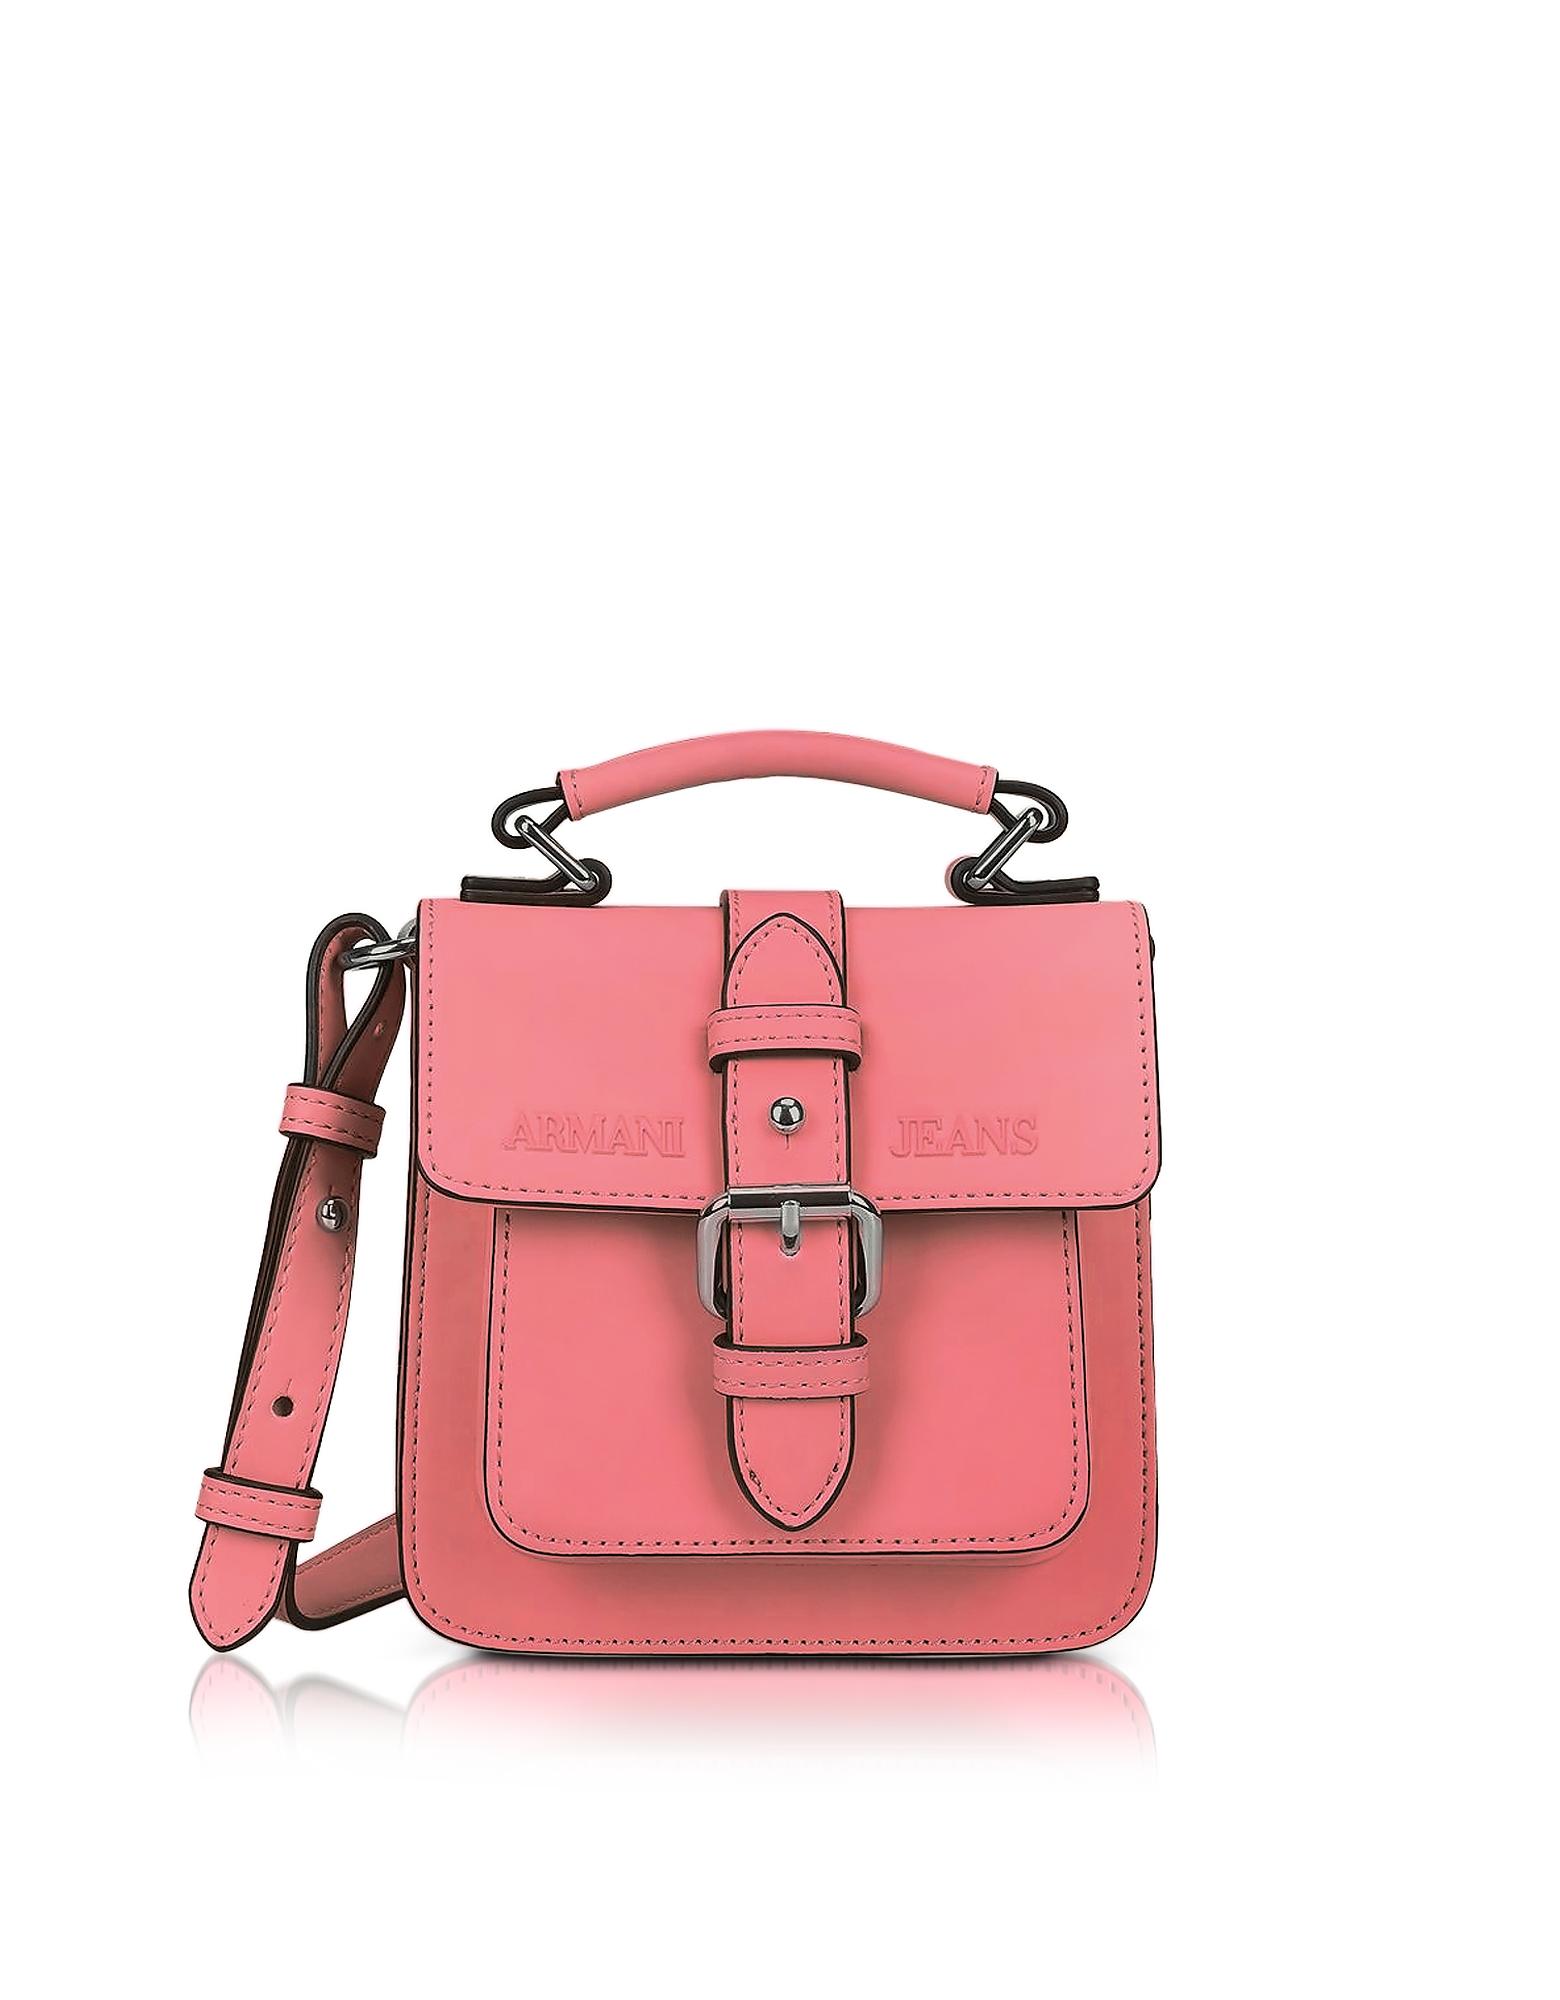 Armani Jeans Handbags, New Light Geranio Eco Leather Crossbody Bag